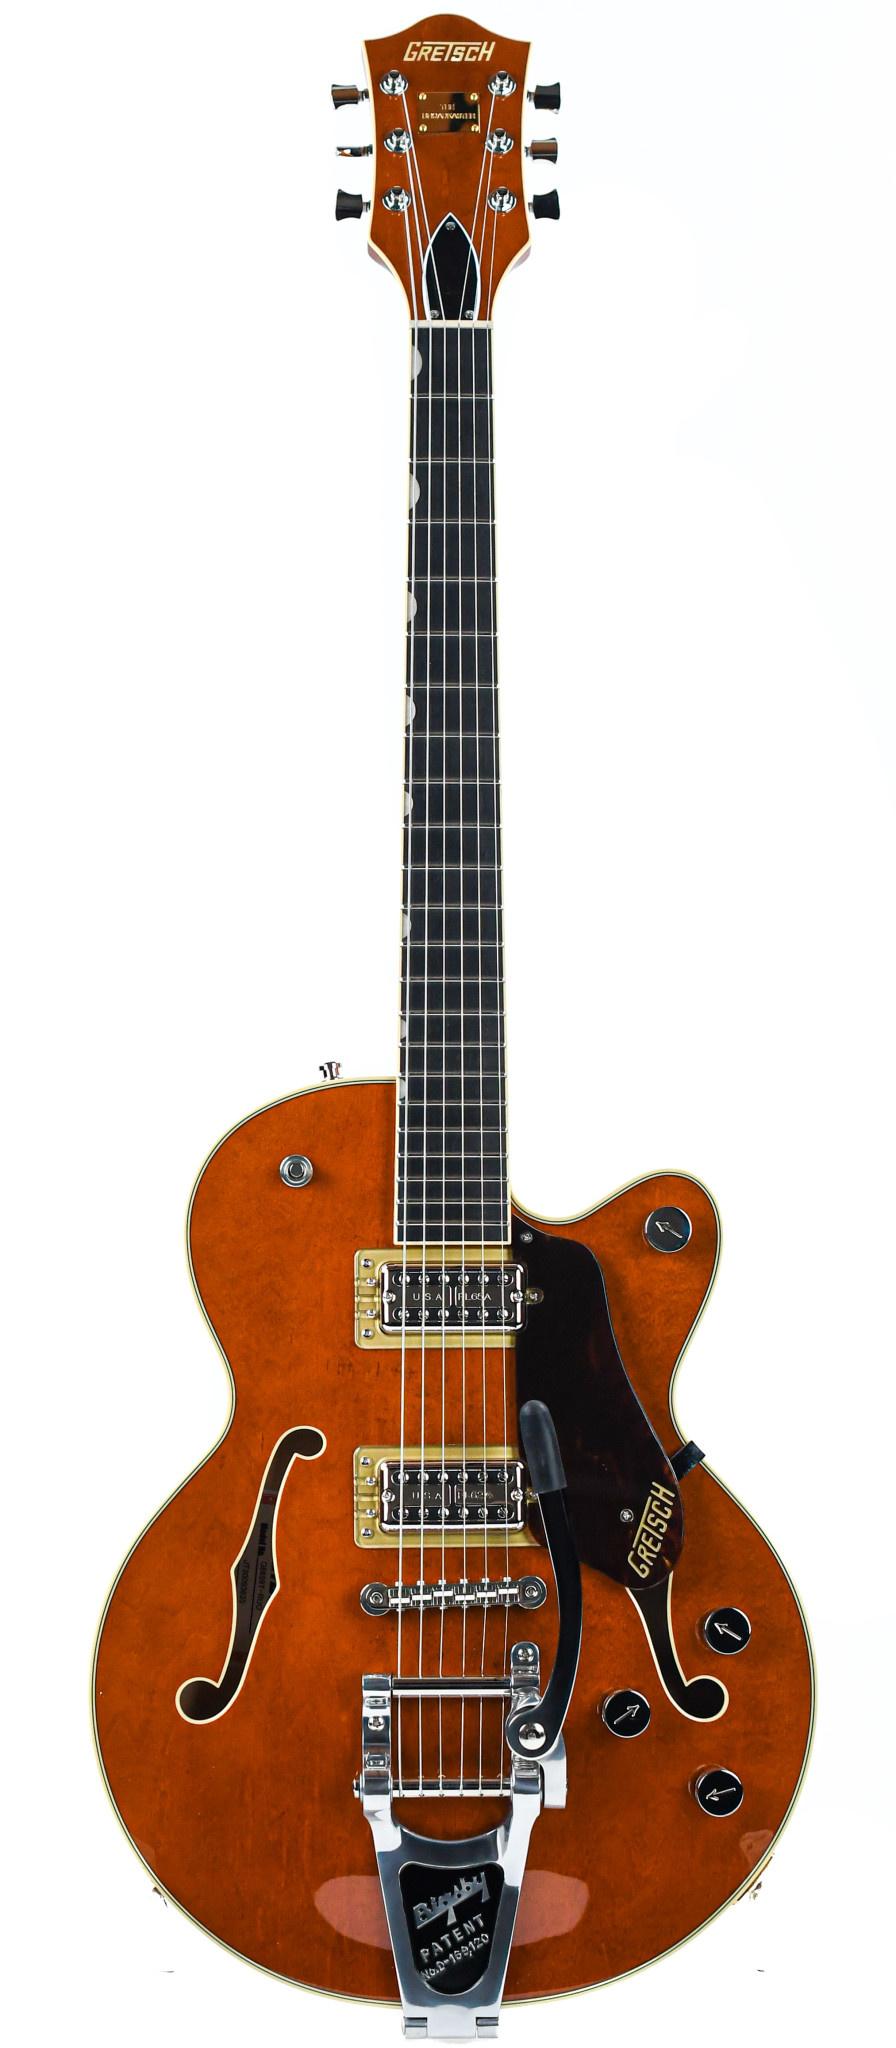 Gretsch G6659T Players Edition Broadkaster Jr. Roundup Orange